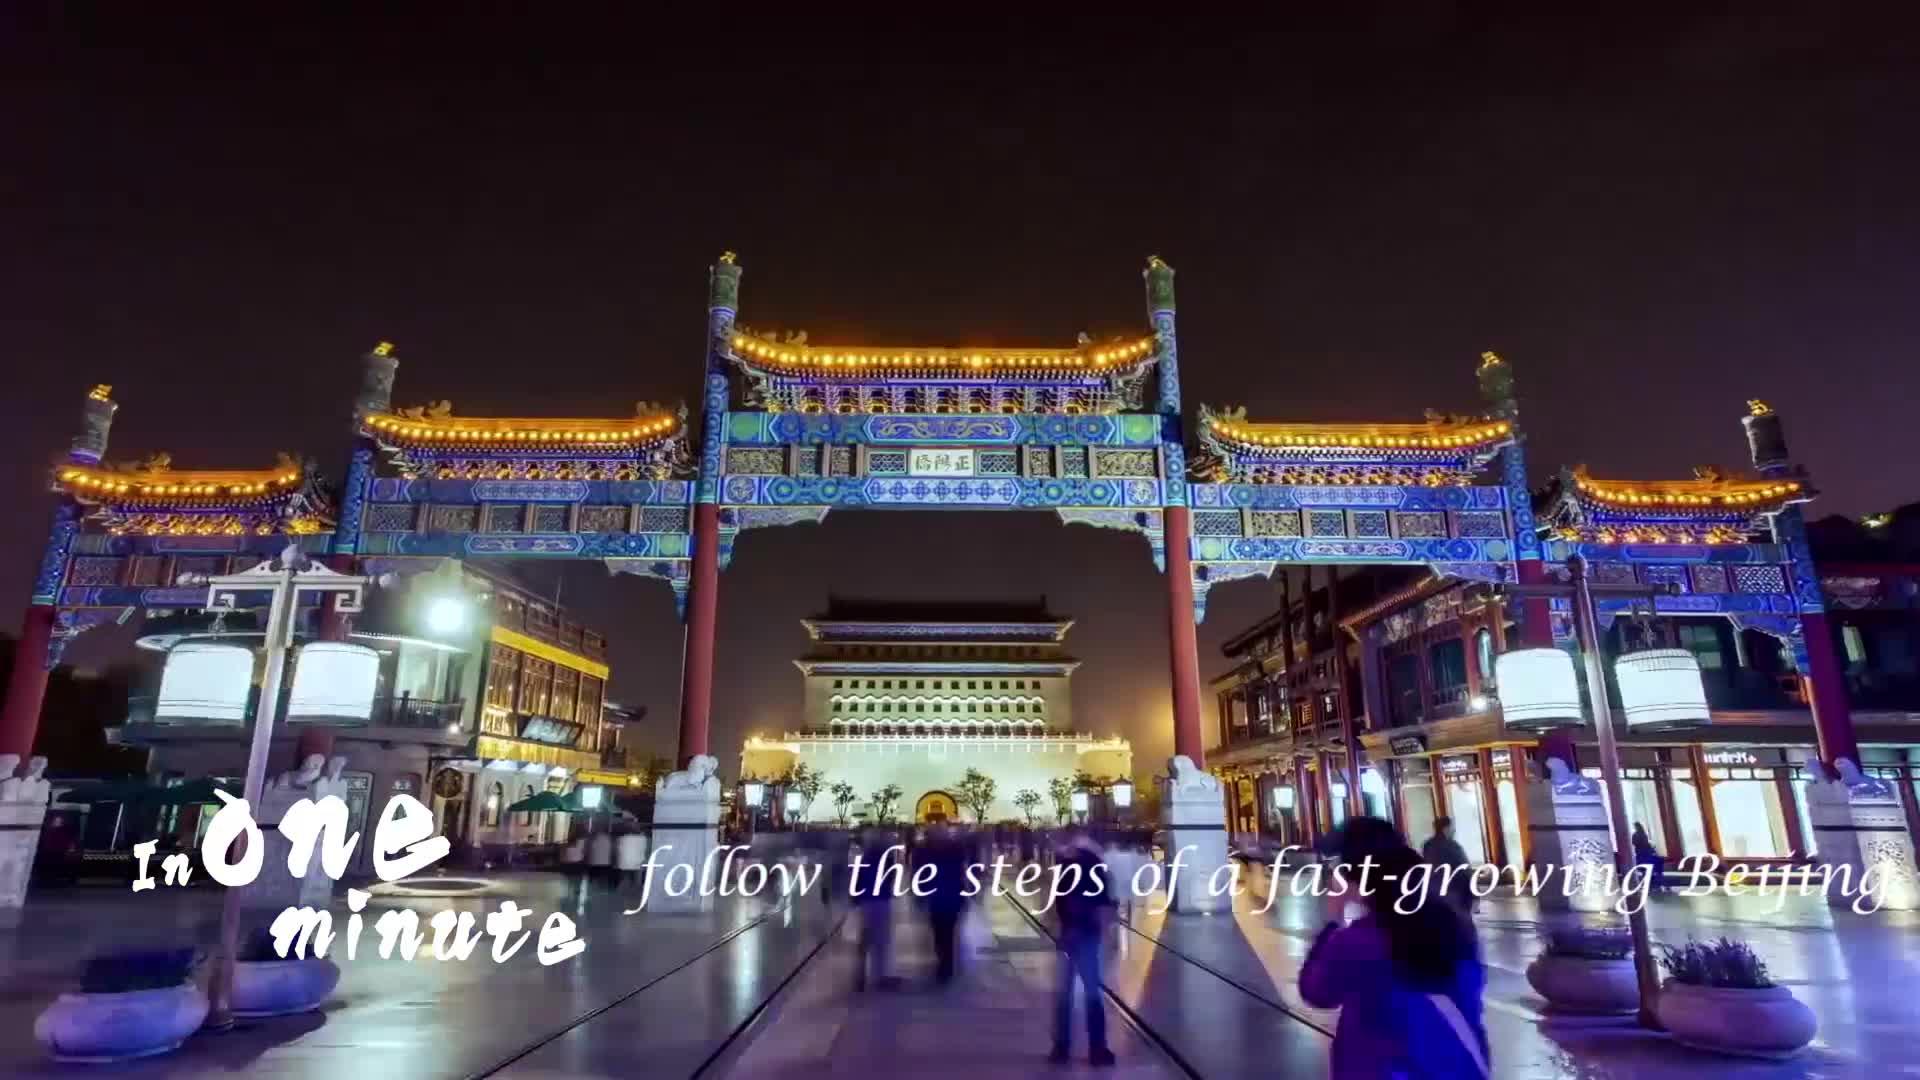 Beijing in One Minute